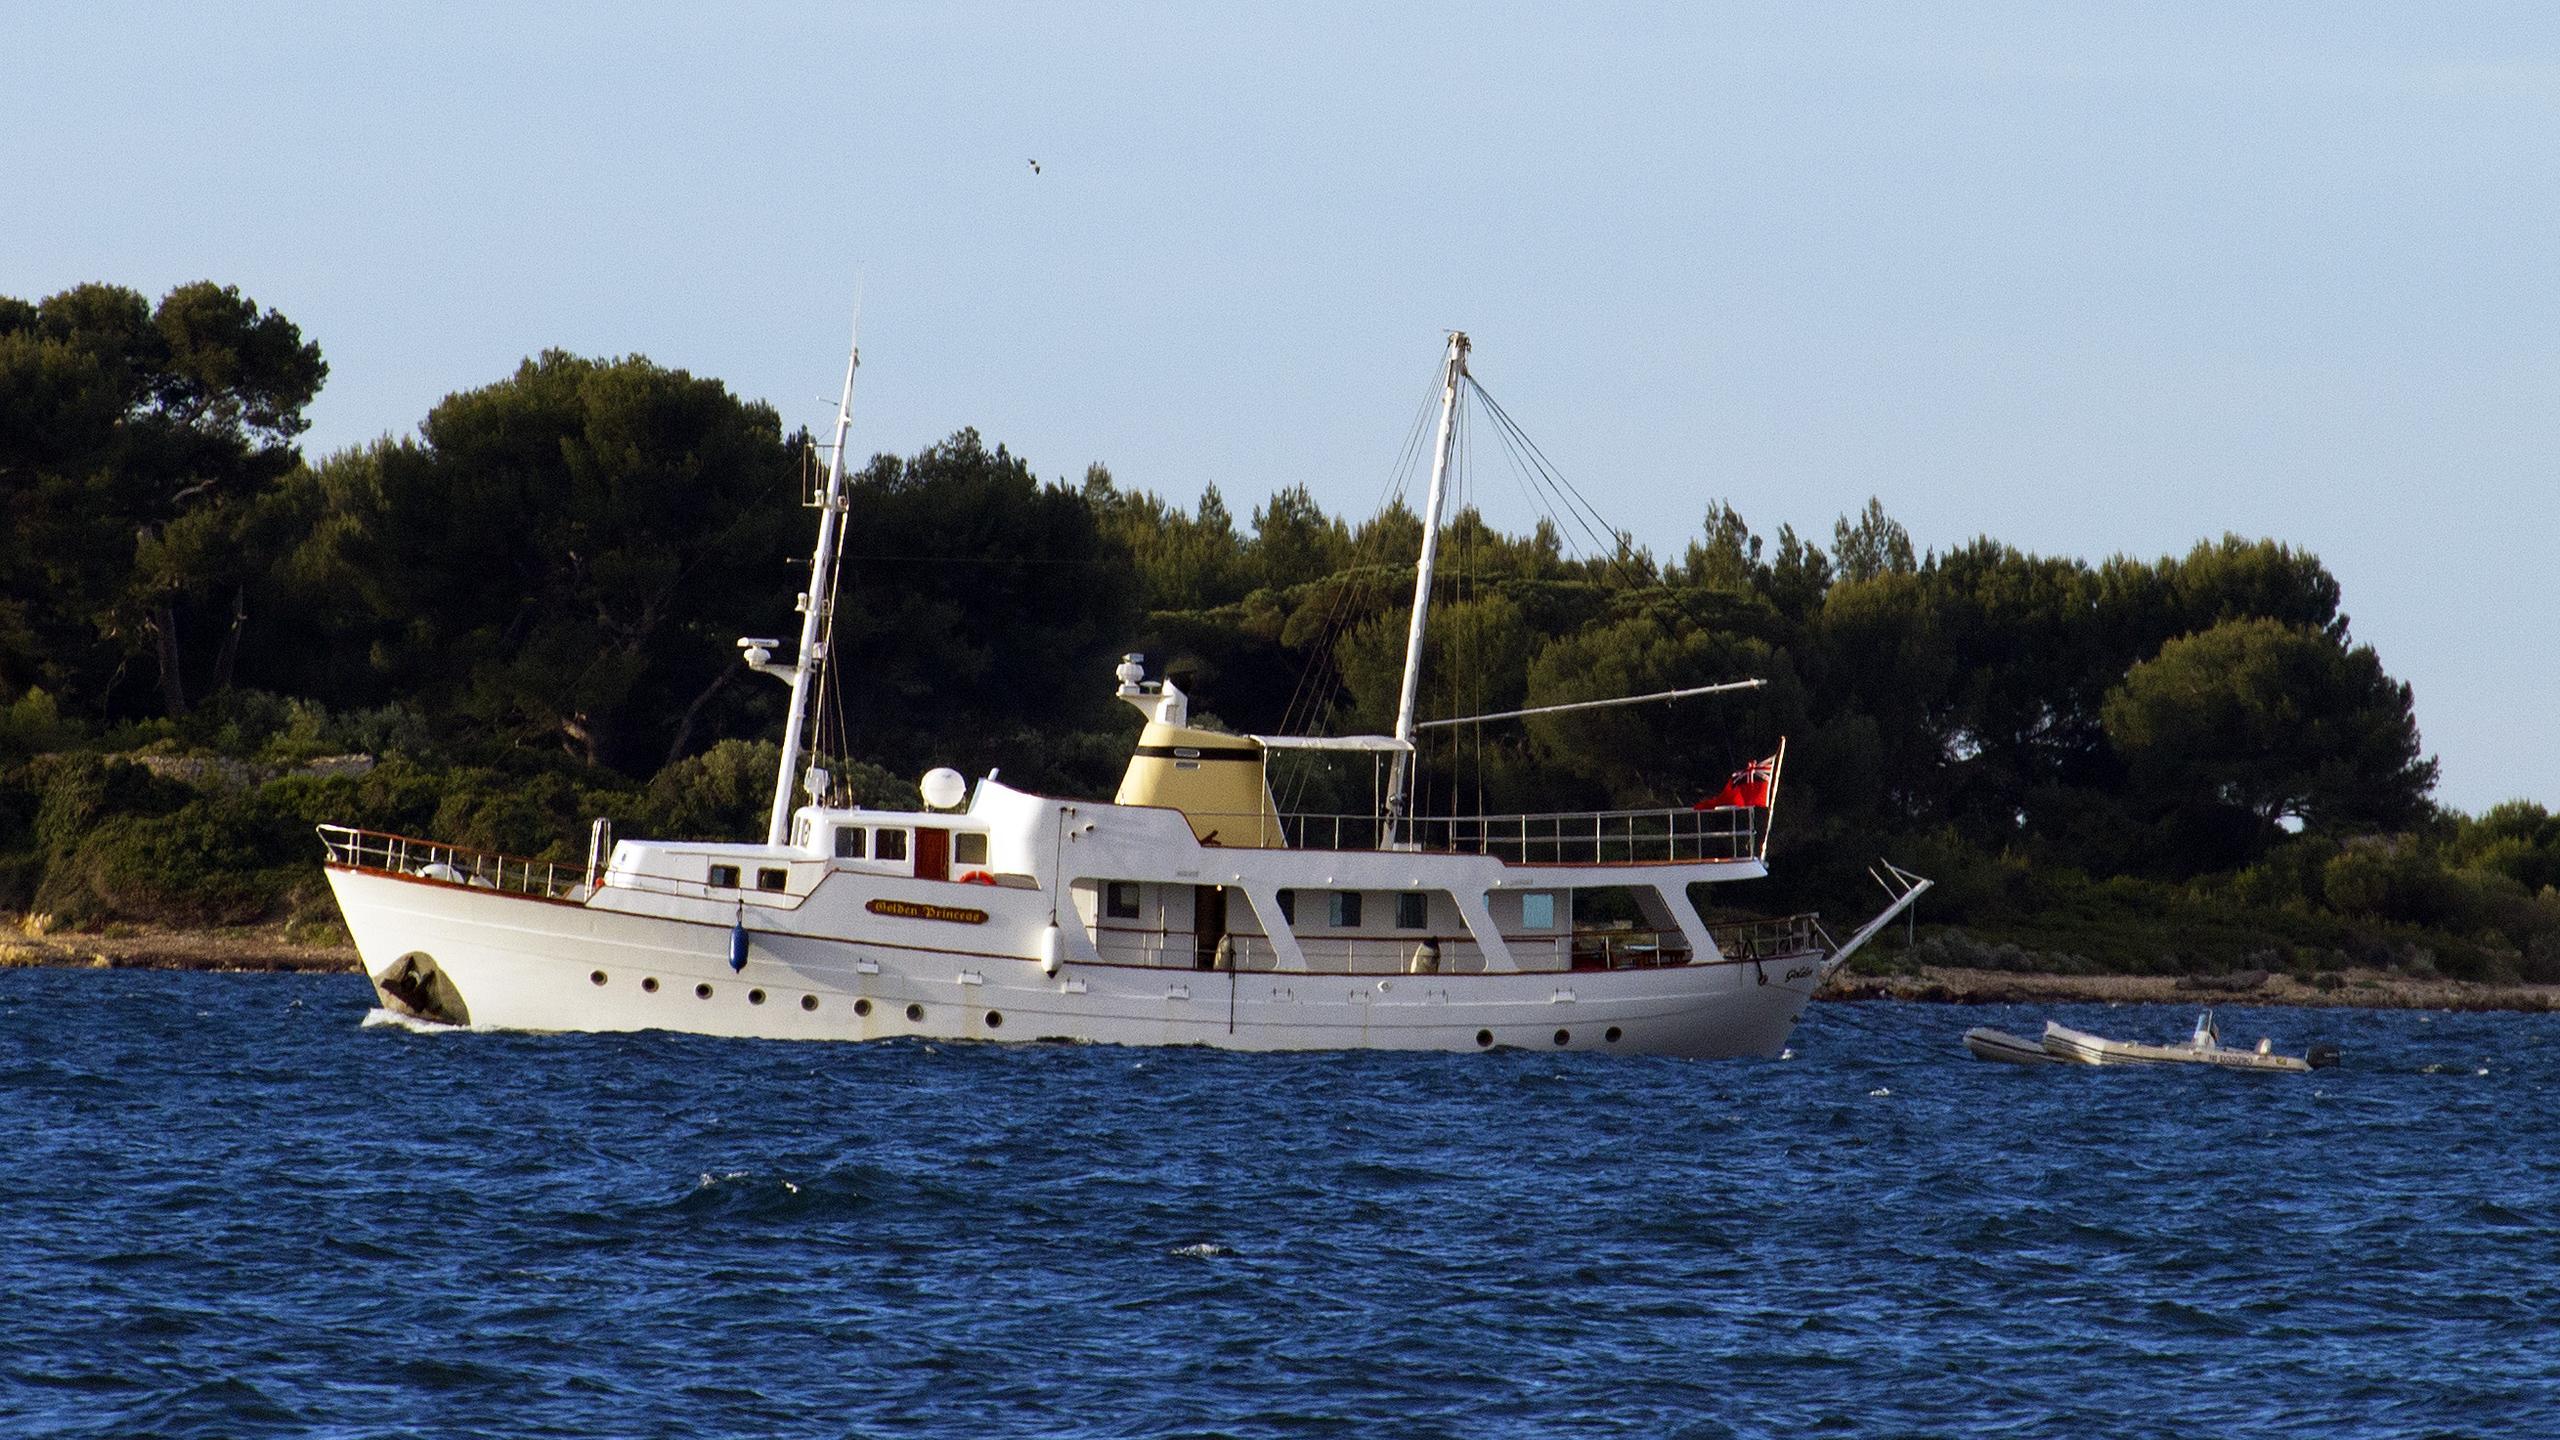 golden-princess-classic-motor-yacht-normandie-1966-26m-running-profile